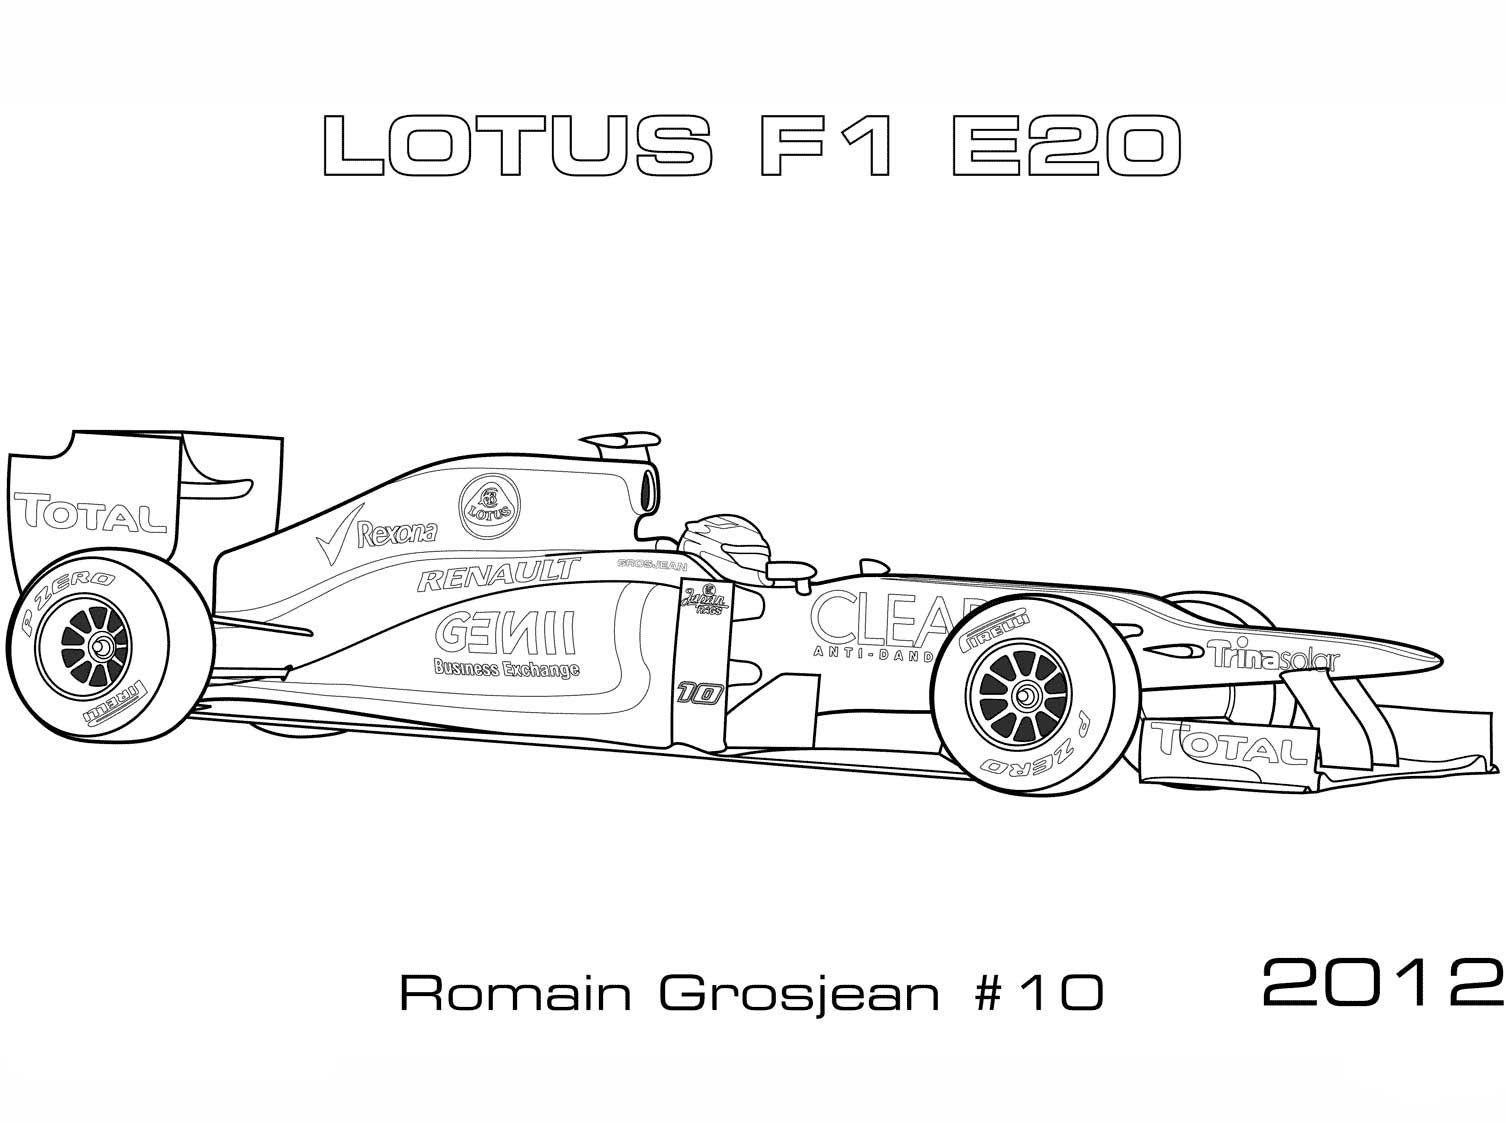 Lotus 2012 E20 Formula 1 Car Coloring Page Cars Coloring Pages Sports Coloring Pages Coloring Pages